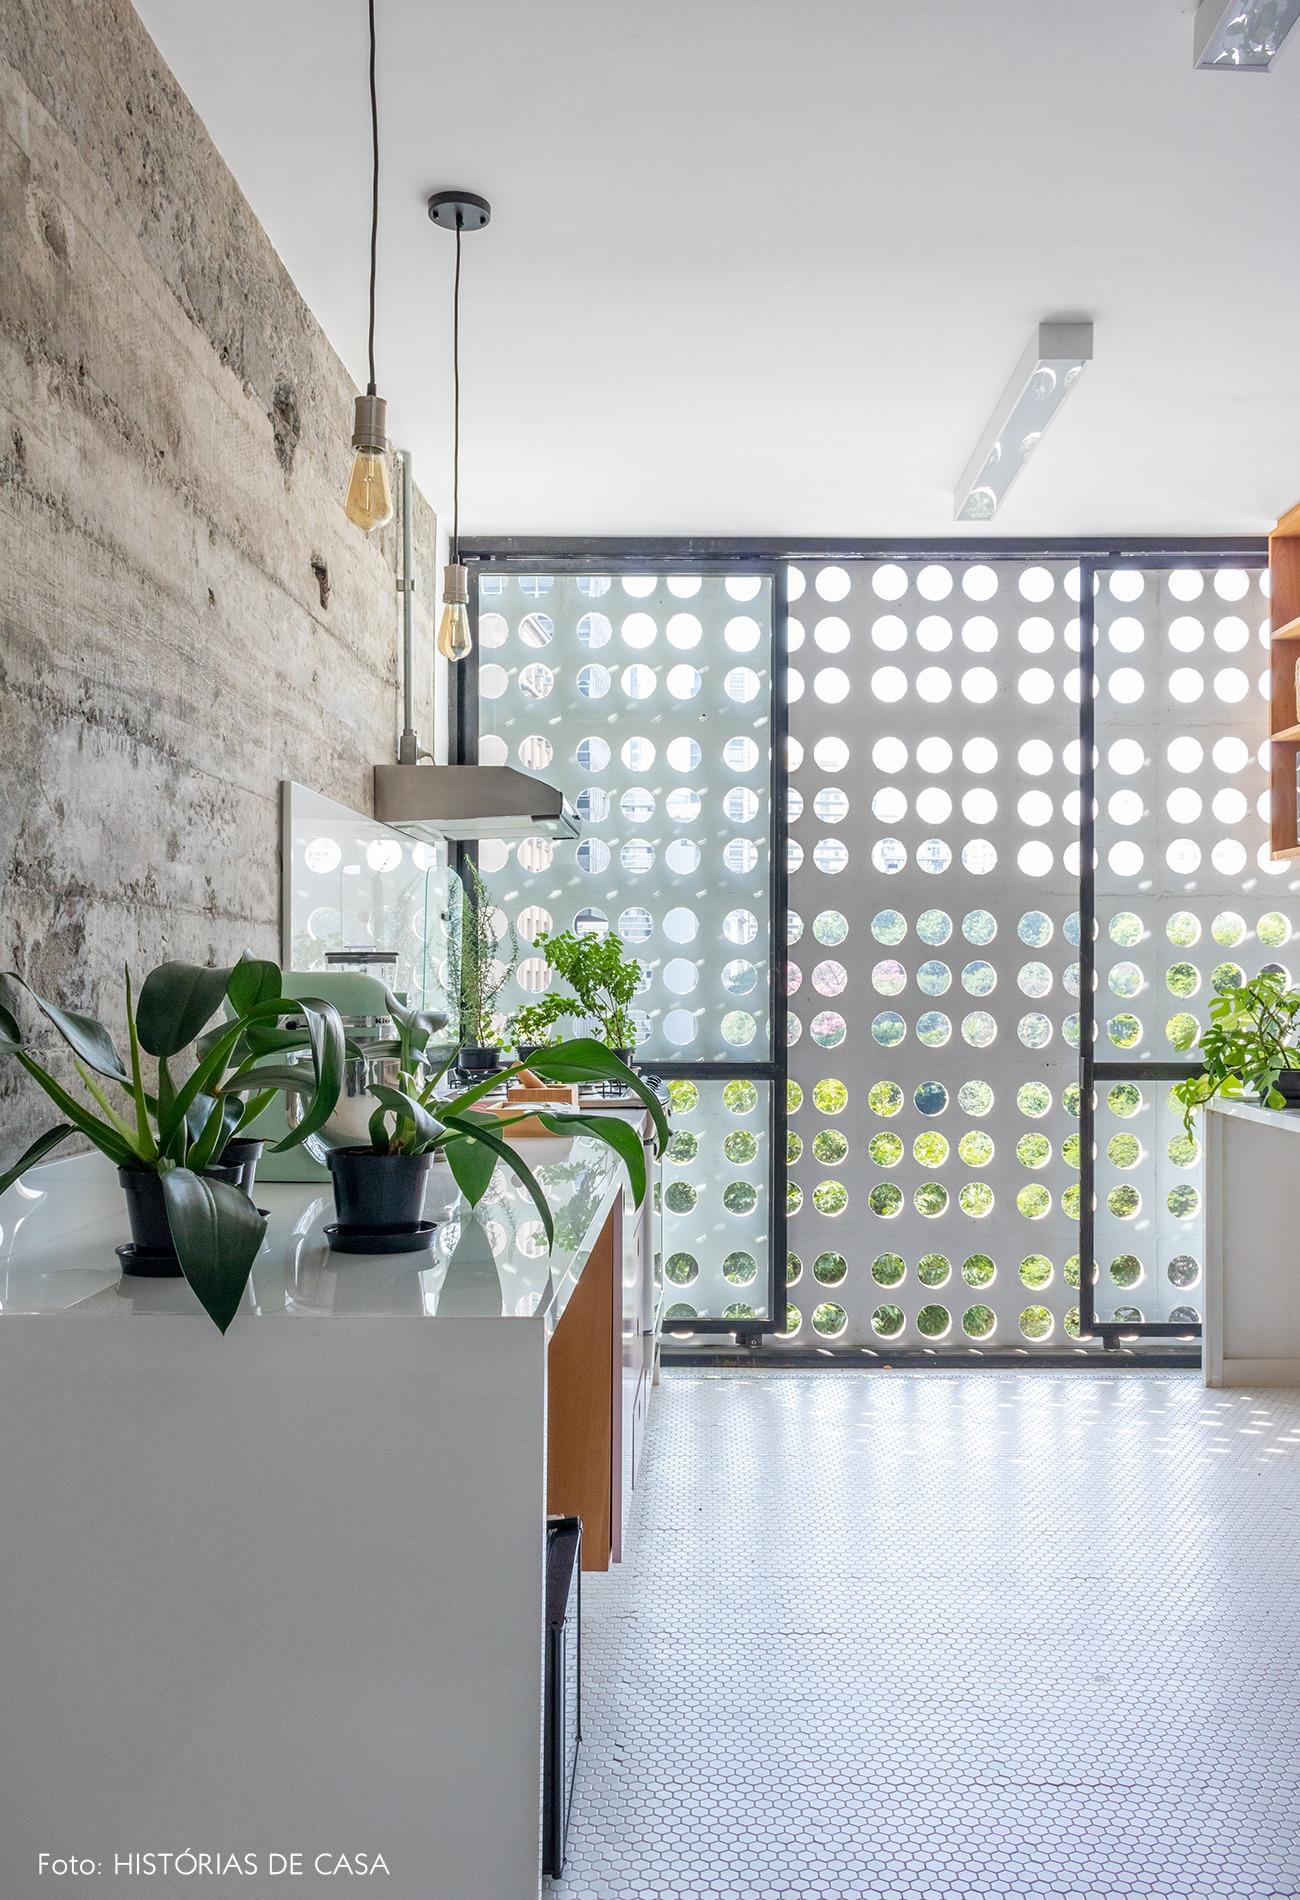 cozinha-janela-grande-cobogo-piso-branco